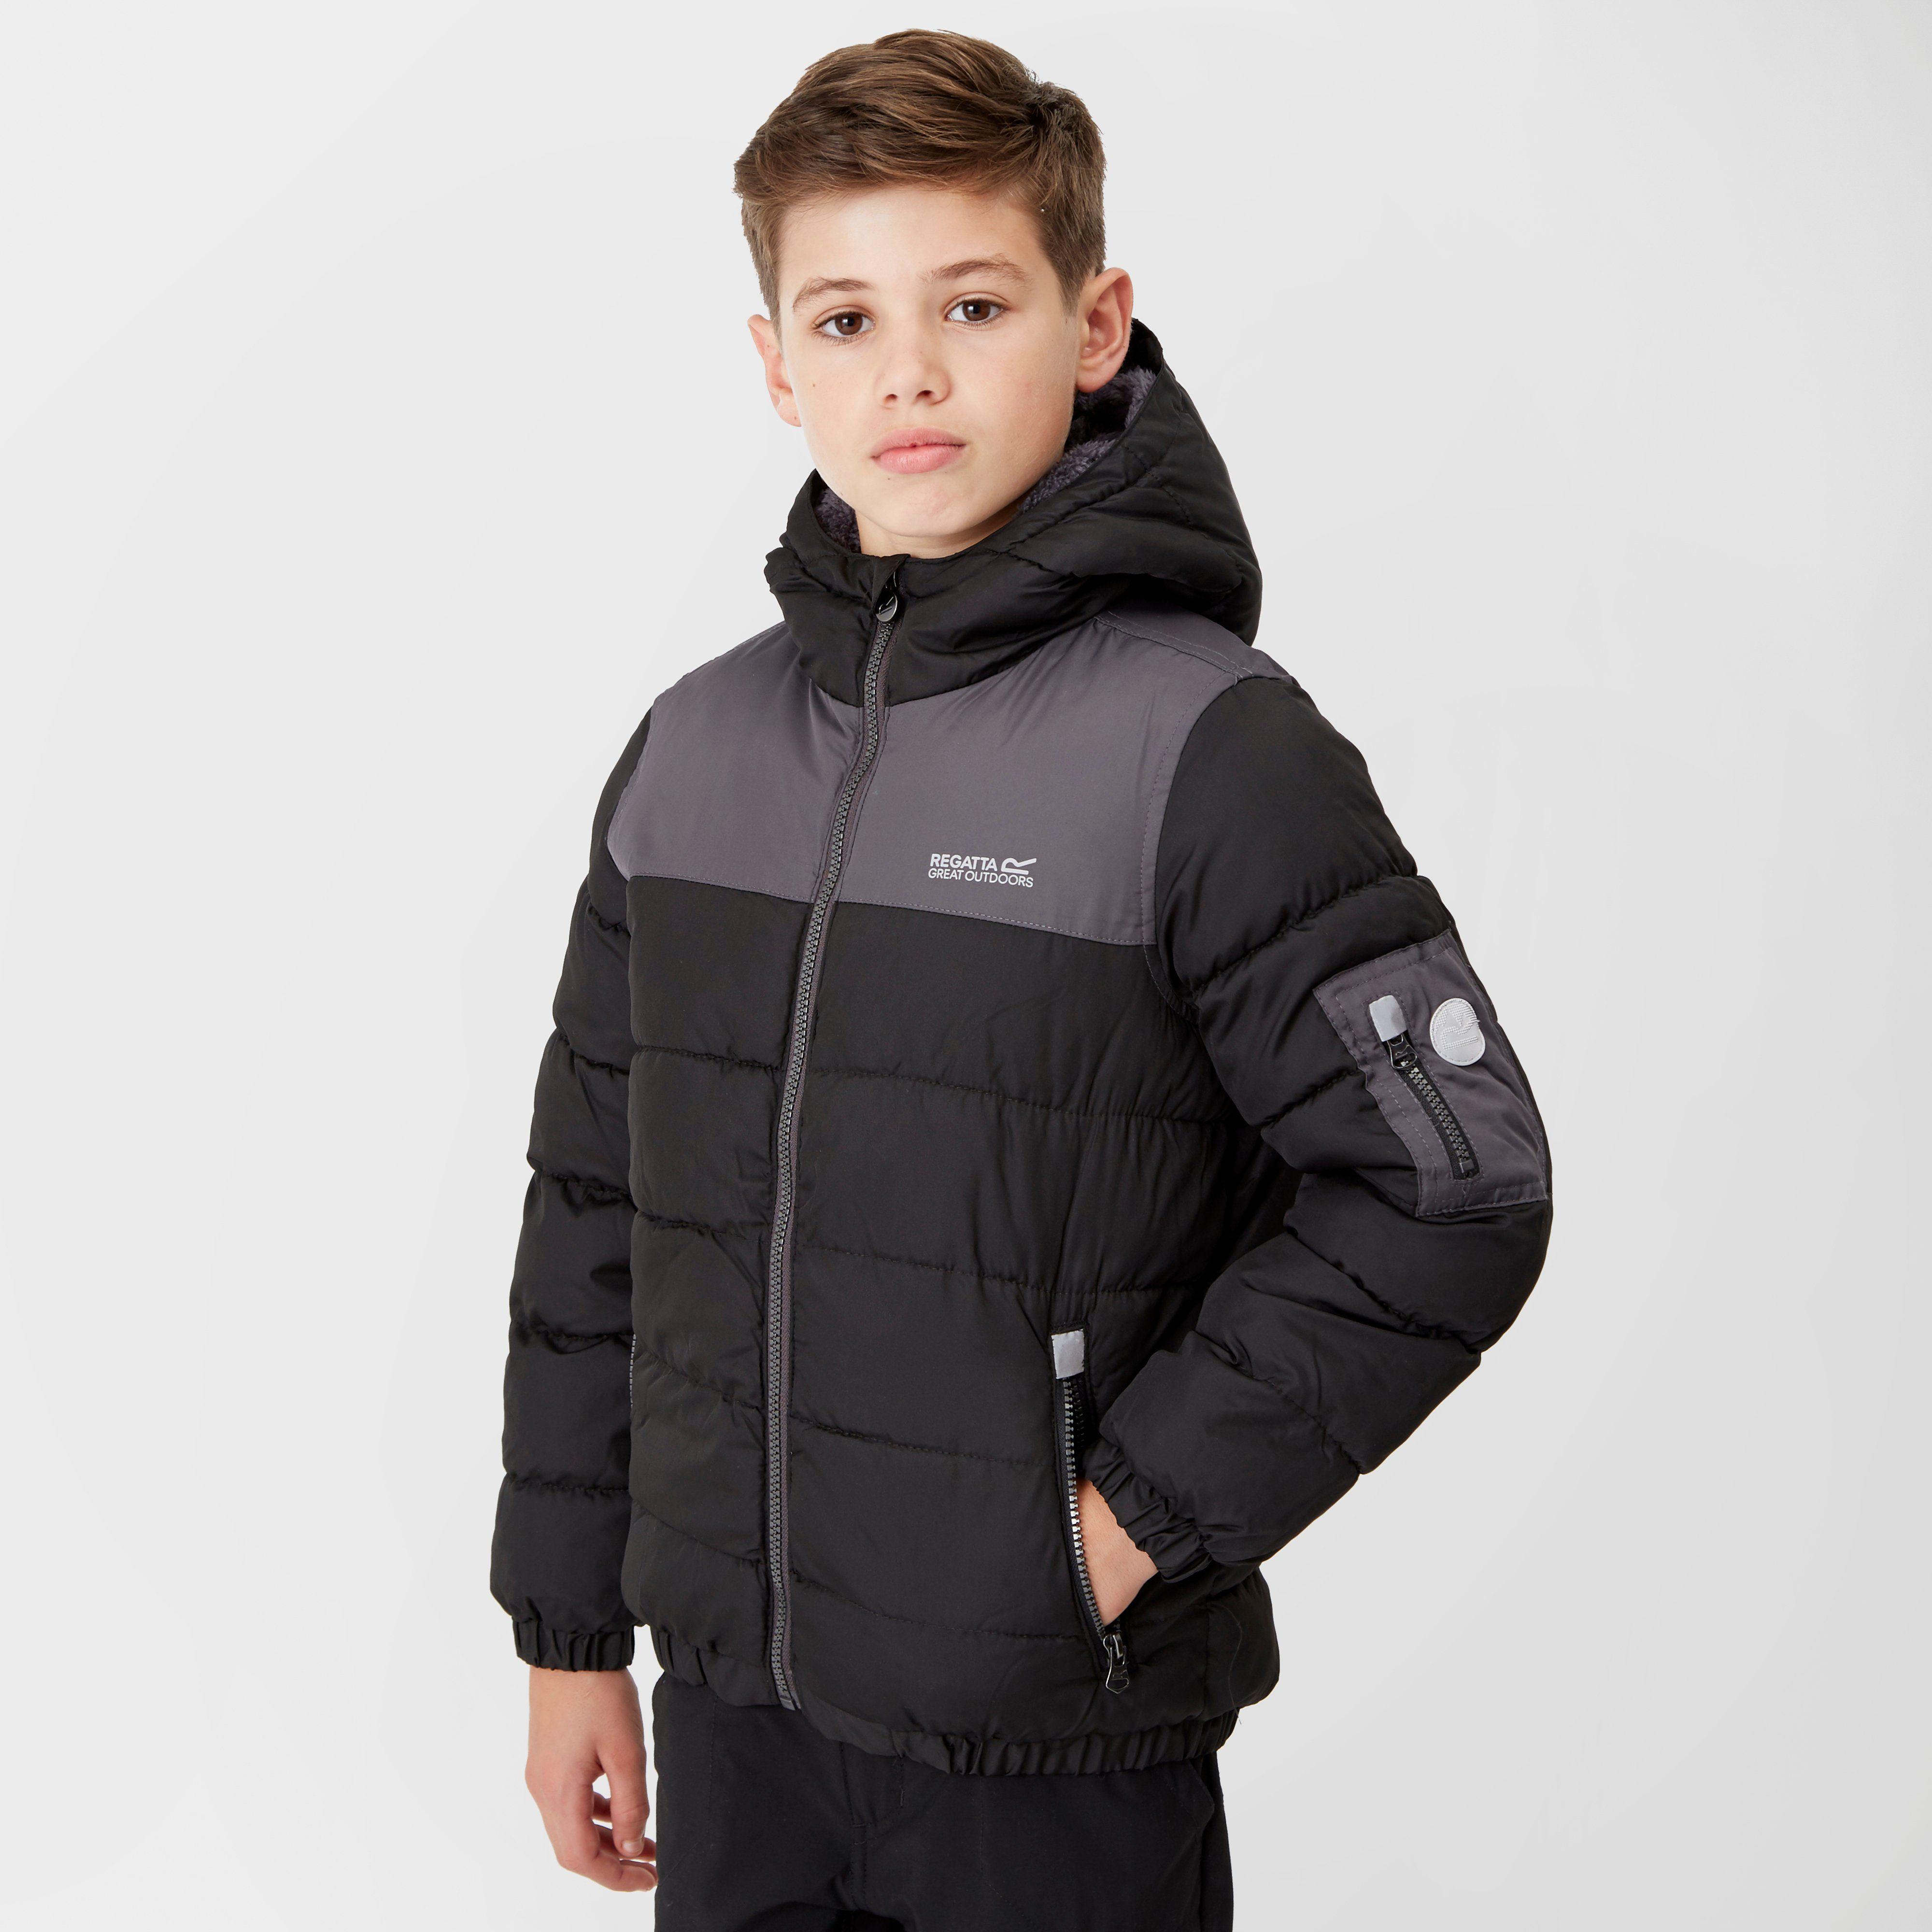 REGATTA Boy's Larkhill Insulated Jacket